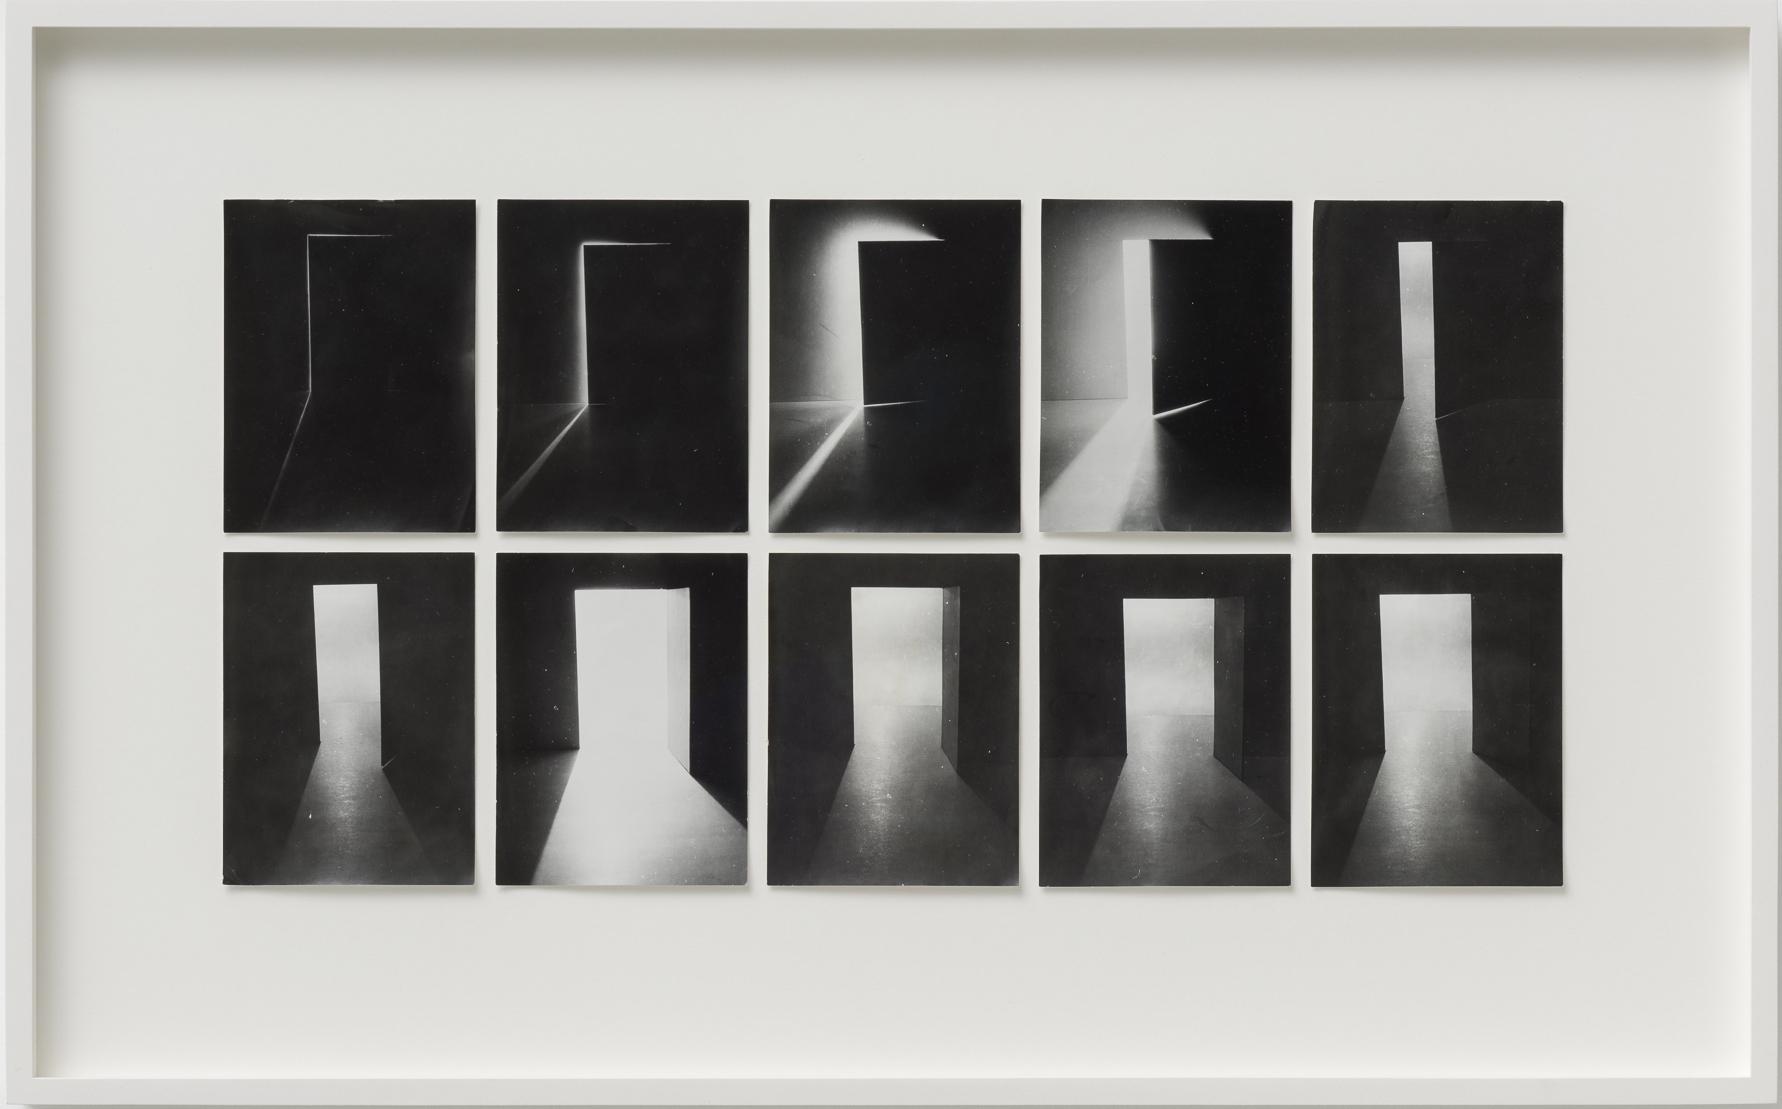 Ferenc Ficzek_Door Opening, 1975, series of 10 silver gelatin prints on paper, 39 x 62,5 cm. Photo: Marcus Schneider